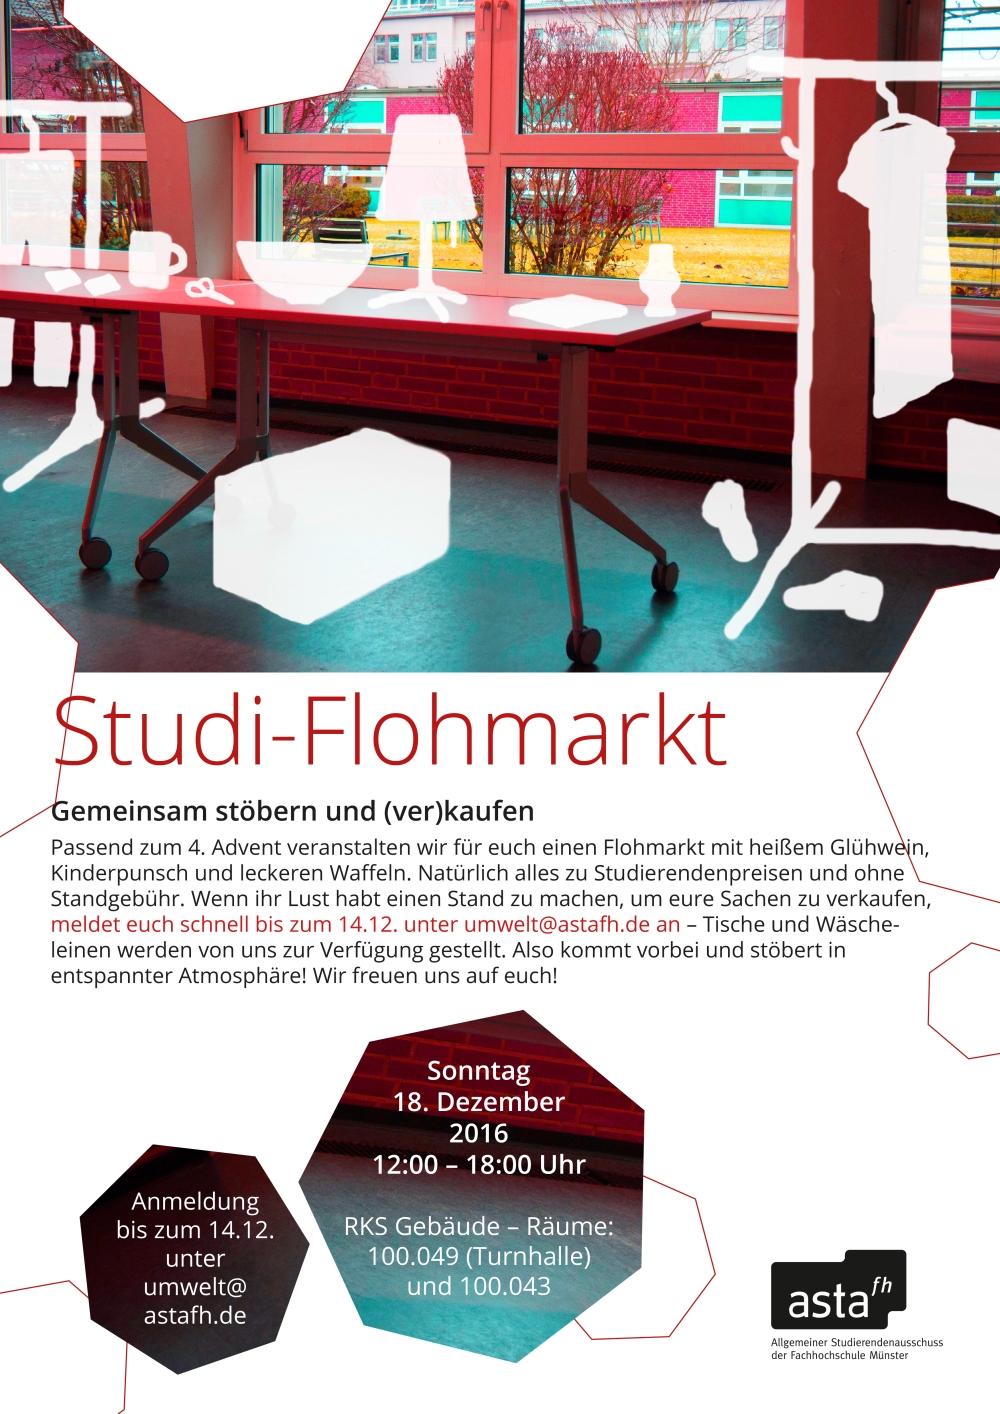 studi_flohmarkt_A3 (1).jpg